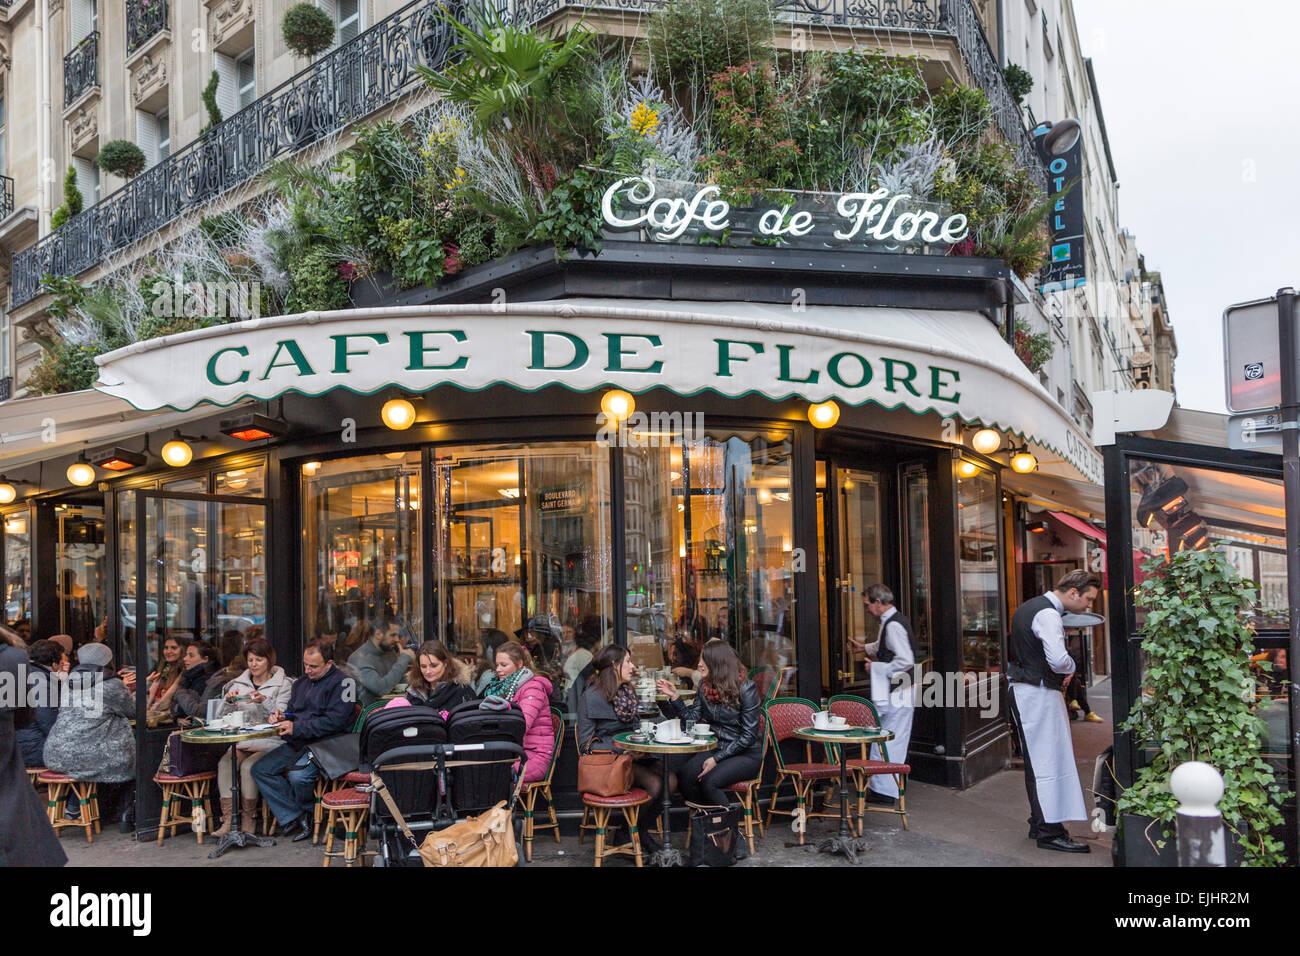 Cafe De Flore Stock Photos Cafe De Flore Stock Images Alamy - Fotos-de-flore